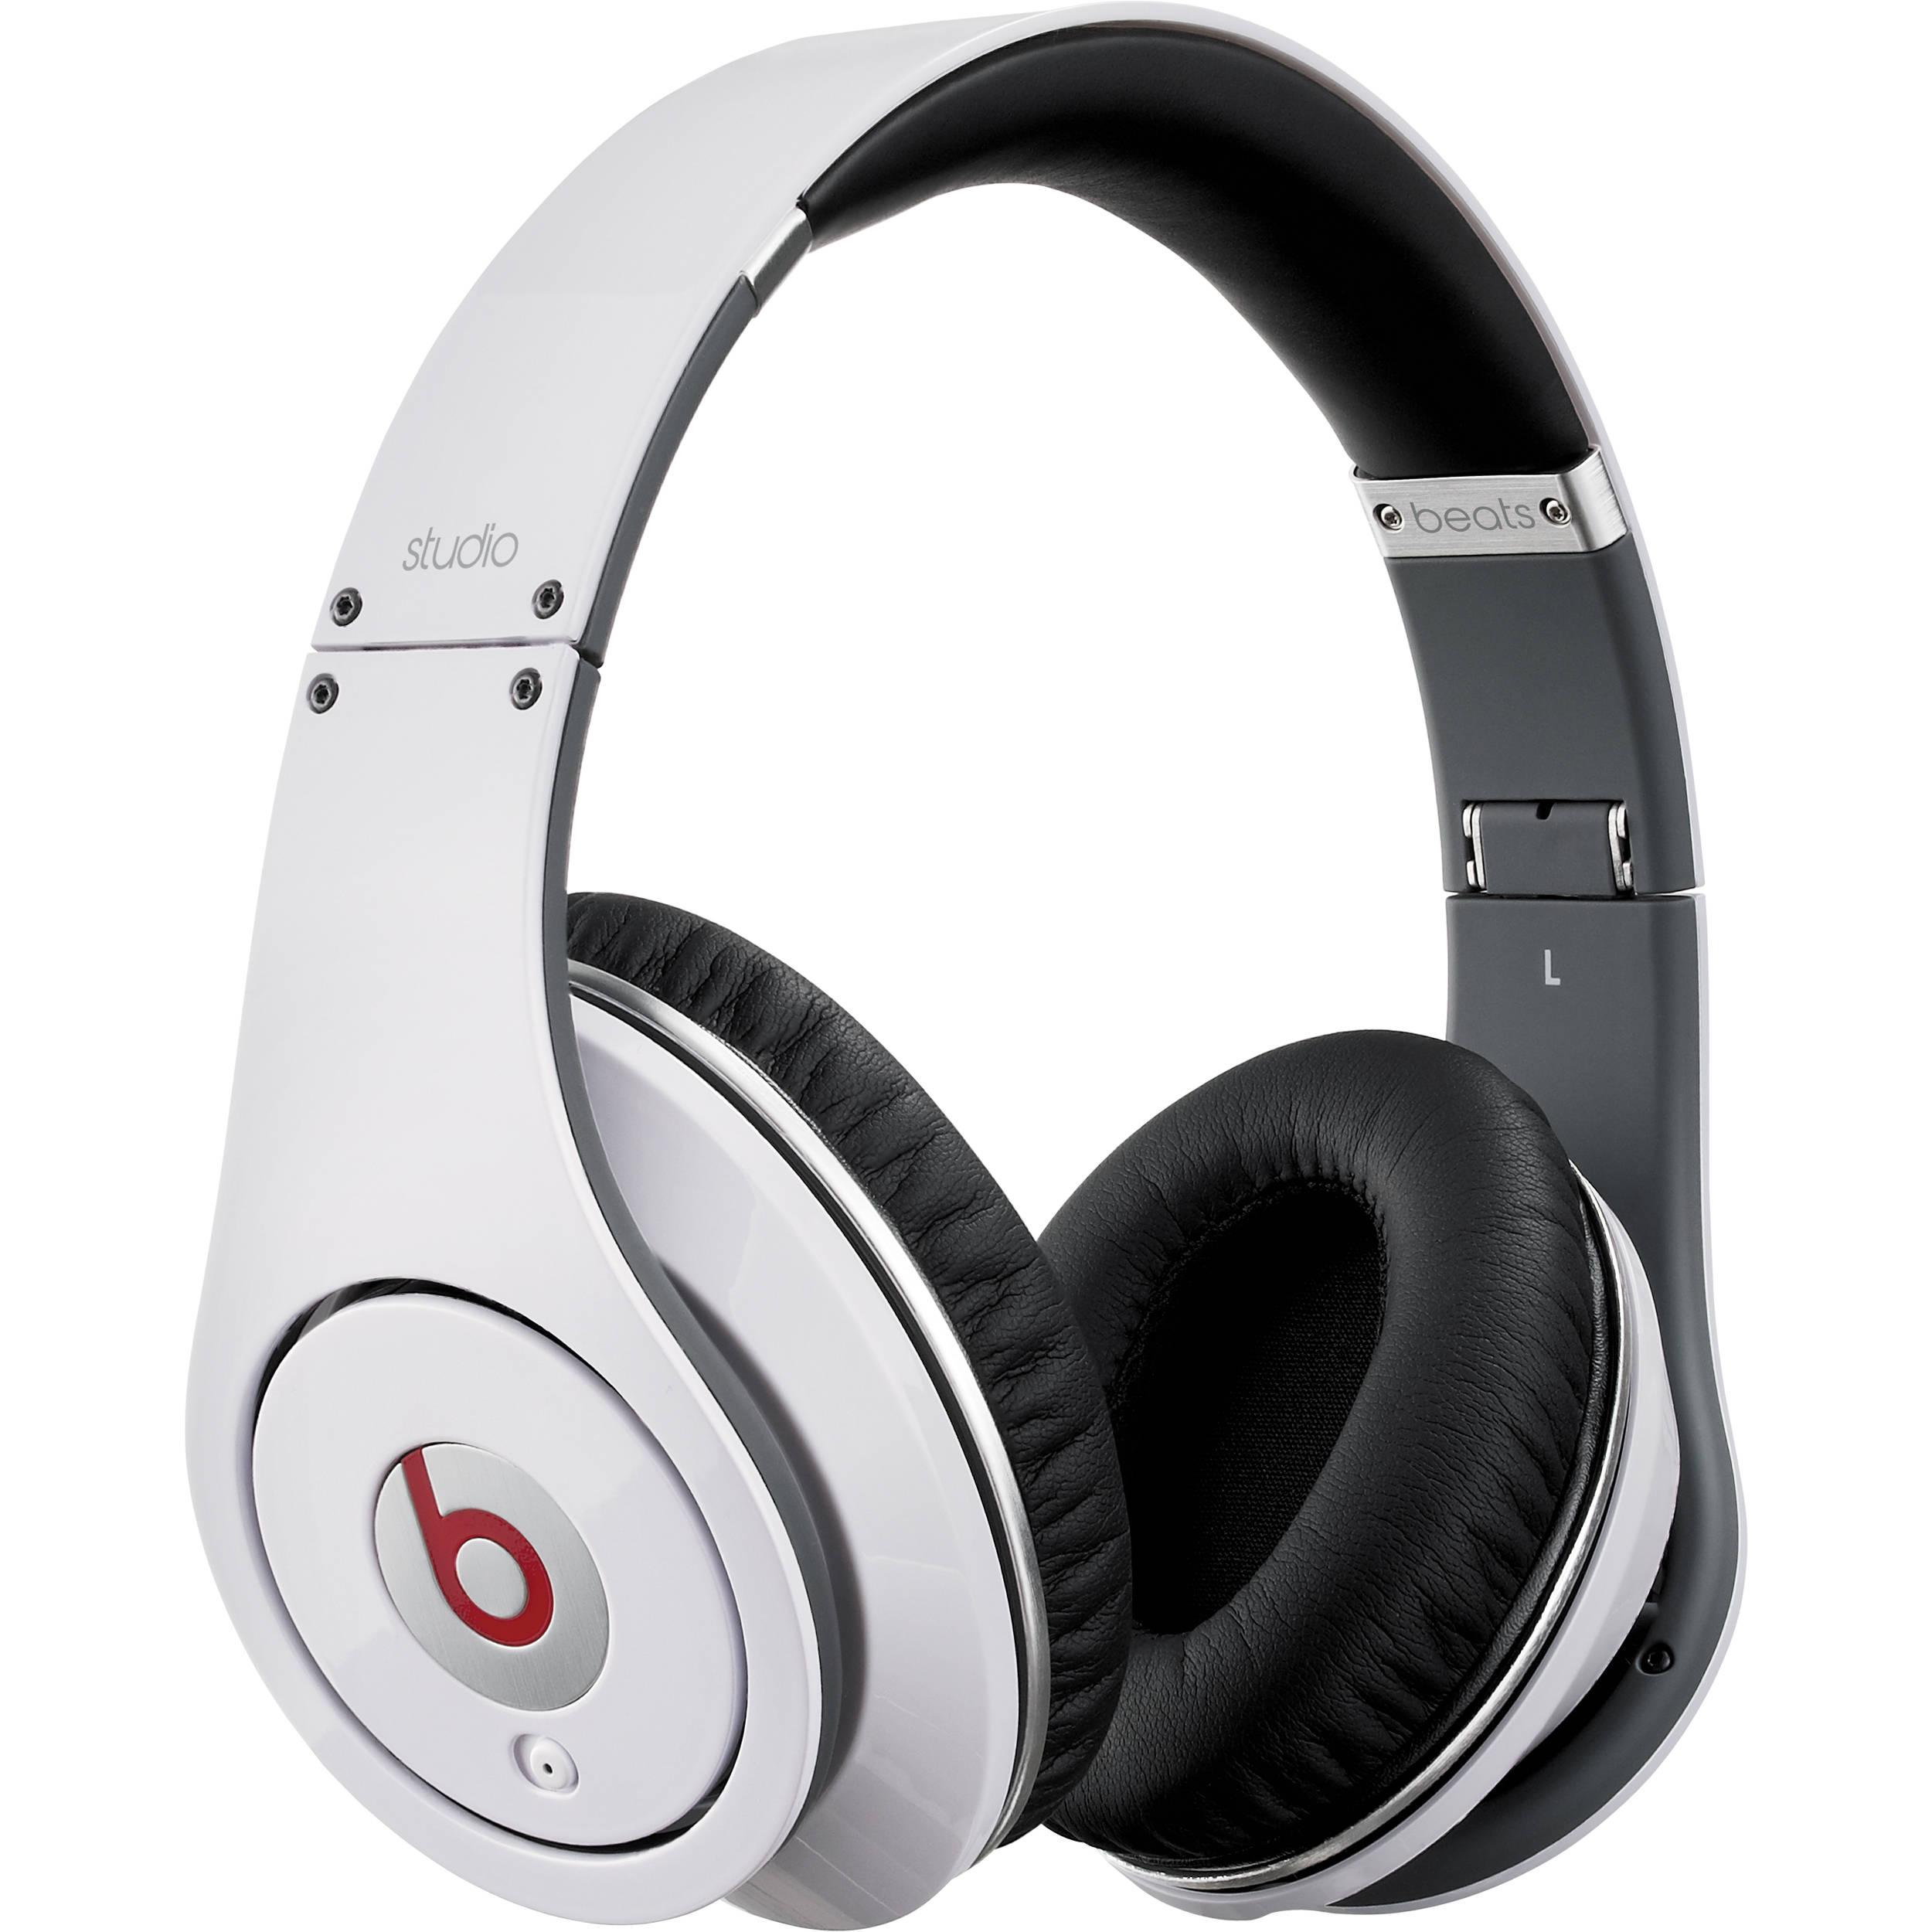 Beats wireless headphones with mic - headphones with mic green